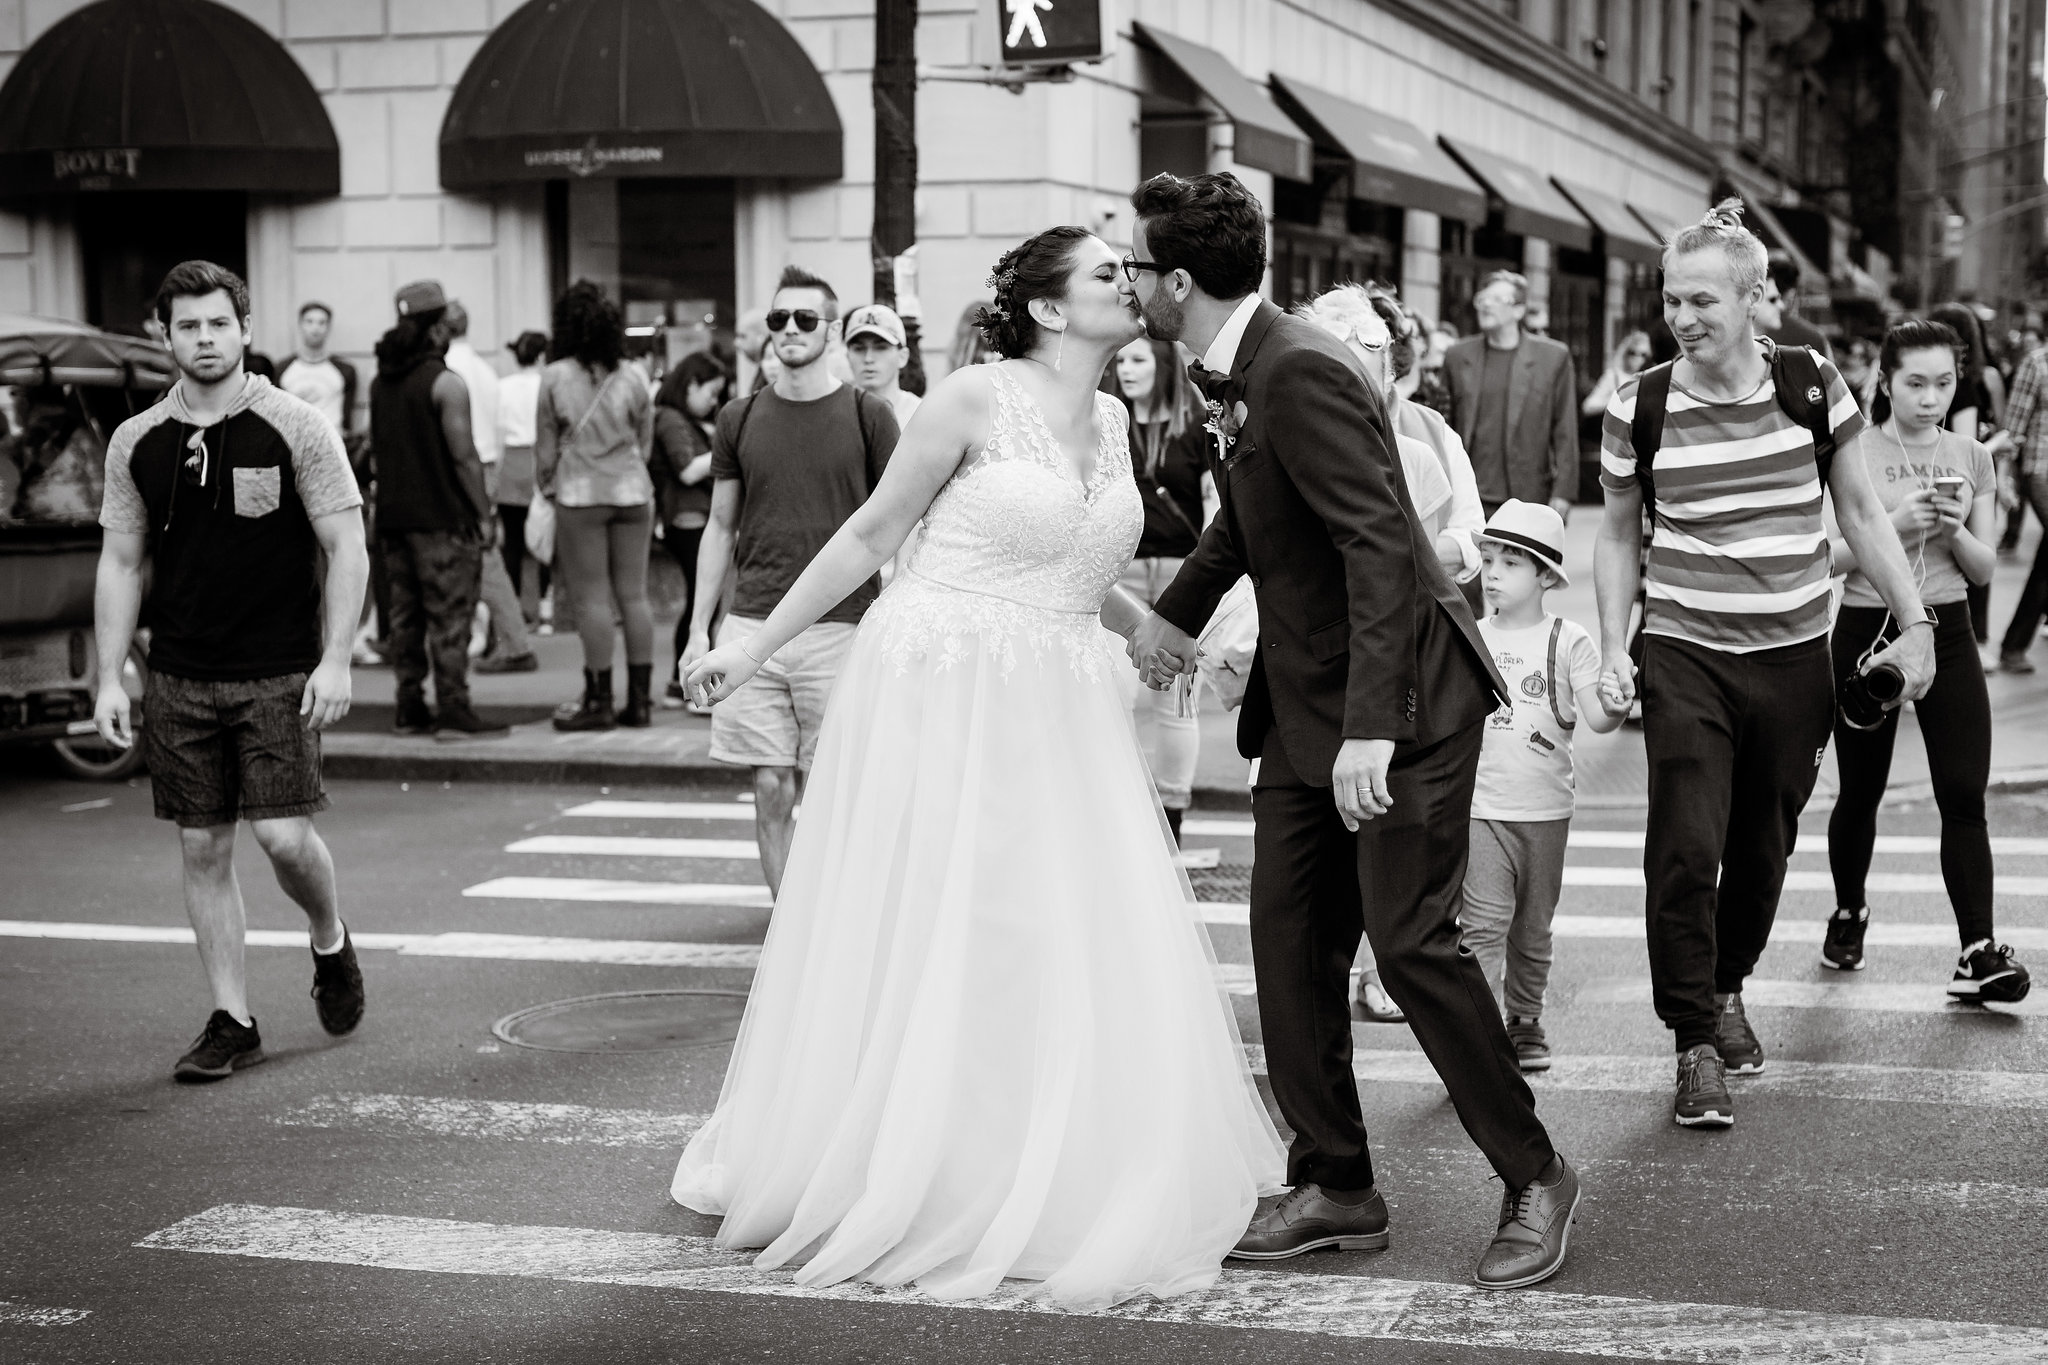 Razan_Amine_wedding_Petronella_Photography_232.jpg